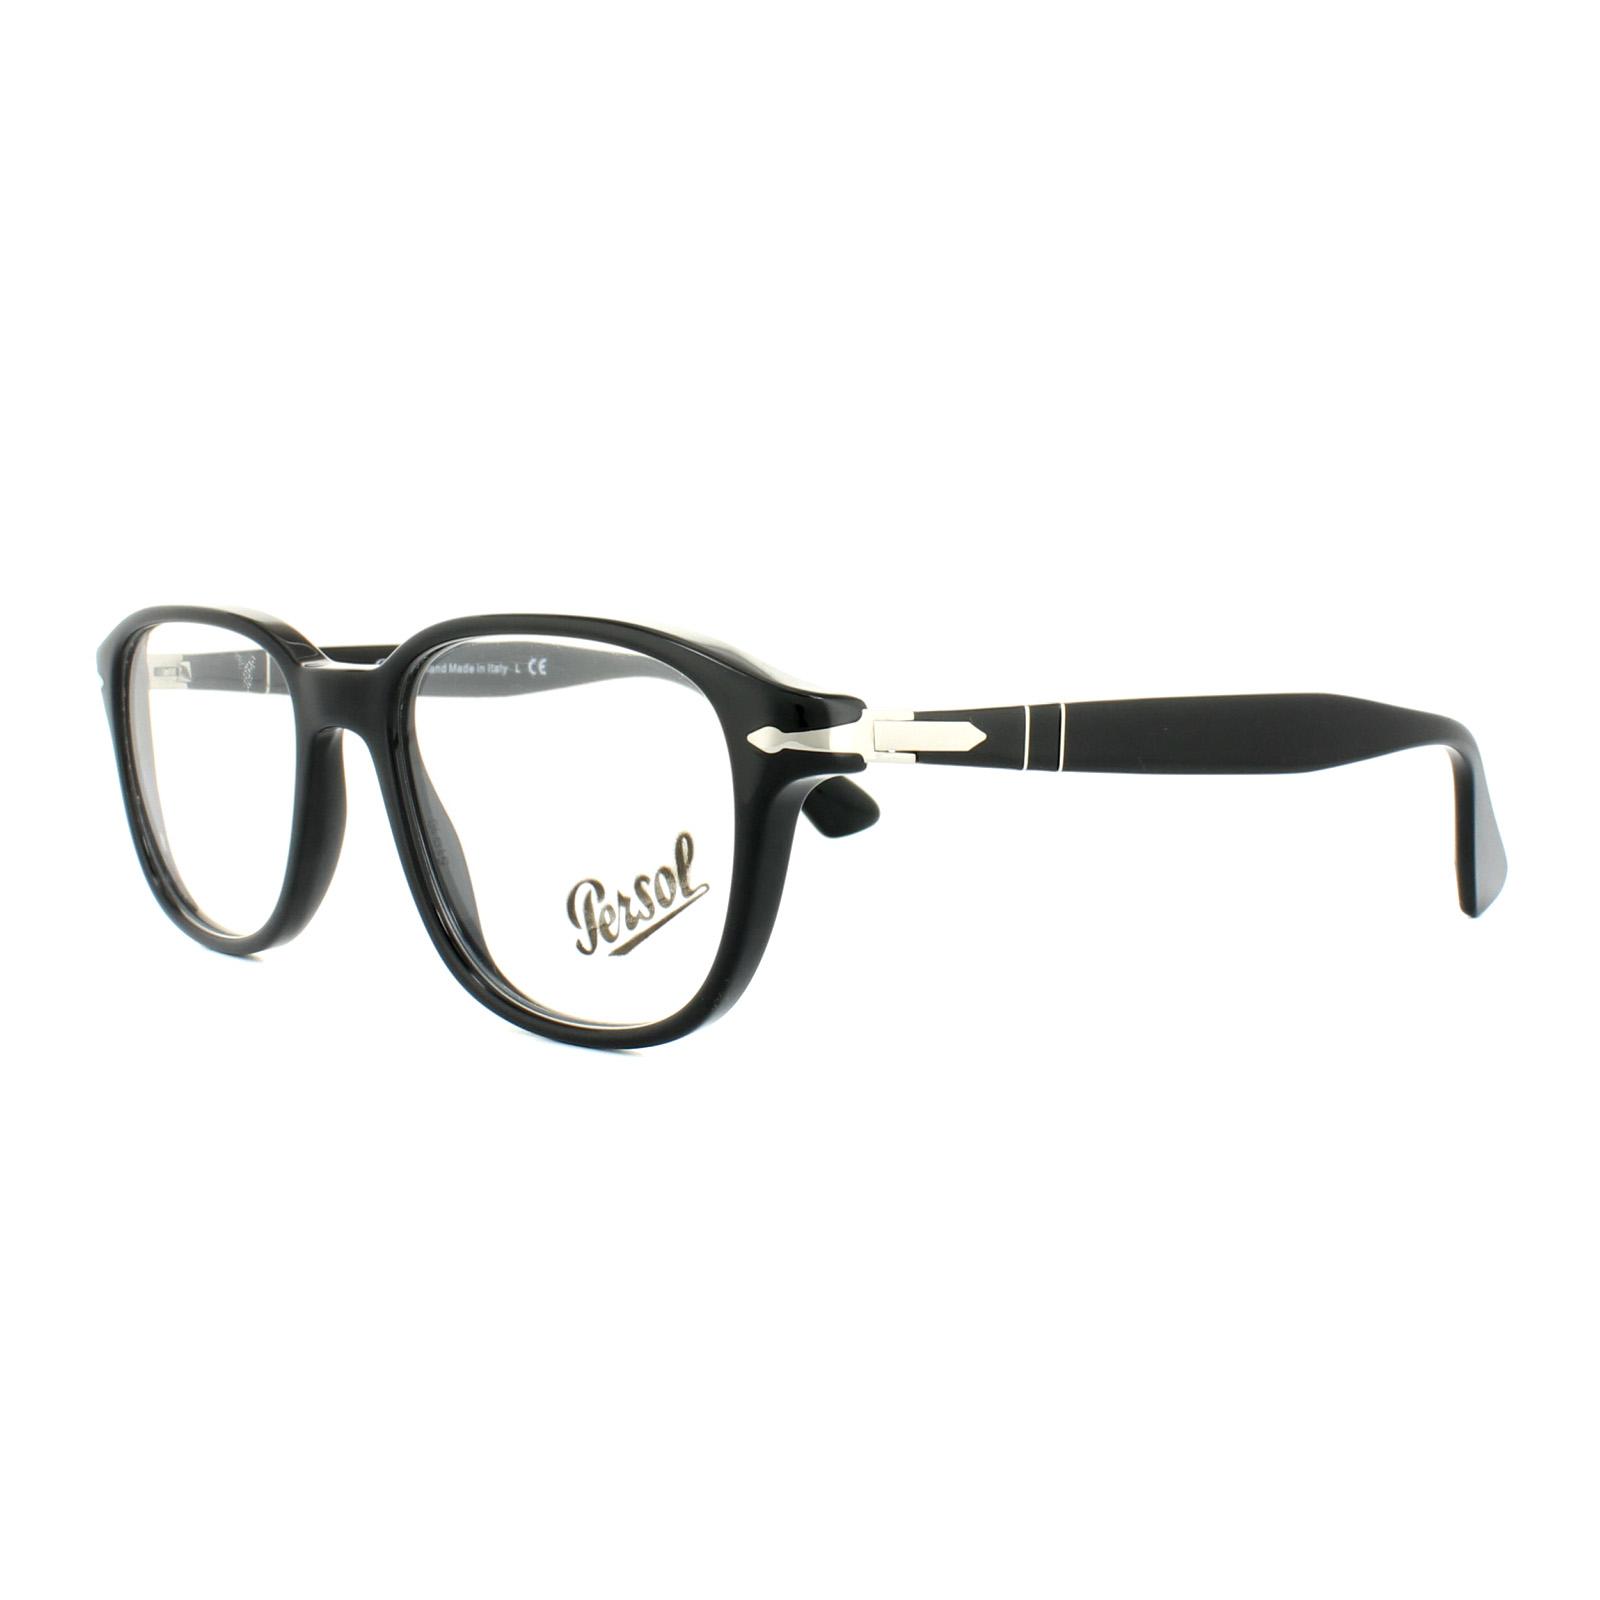 7c0fa63fac Persol Glasses Frames PO 3145V 95 Black Mens 51mm 8053672594065